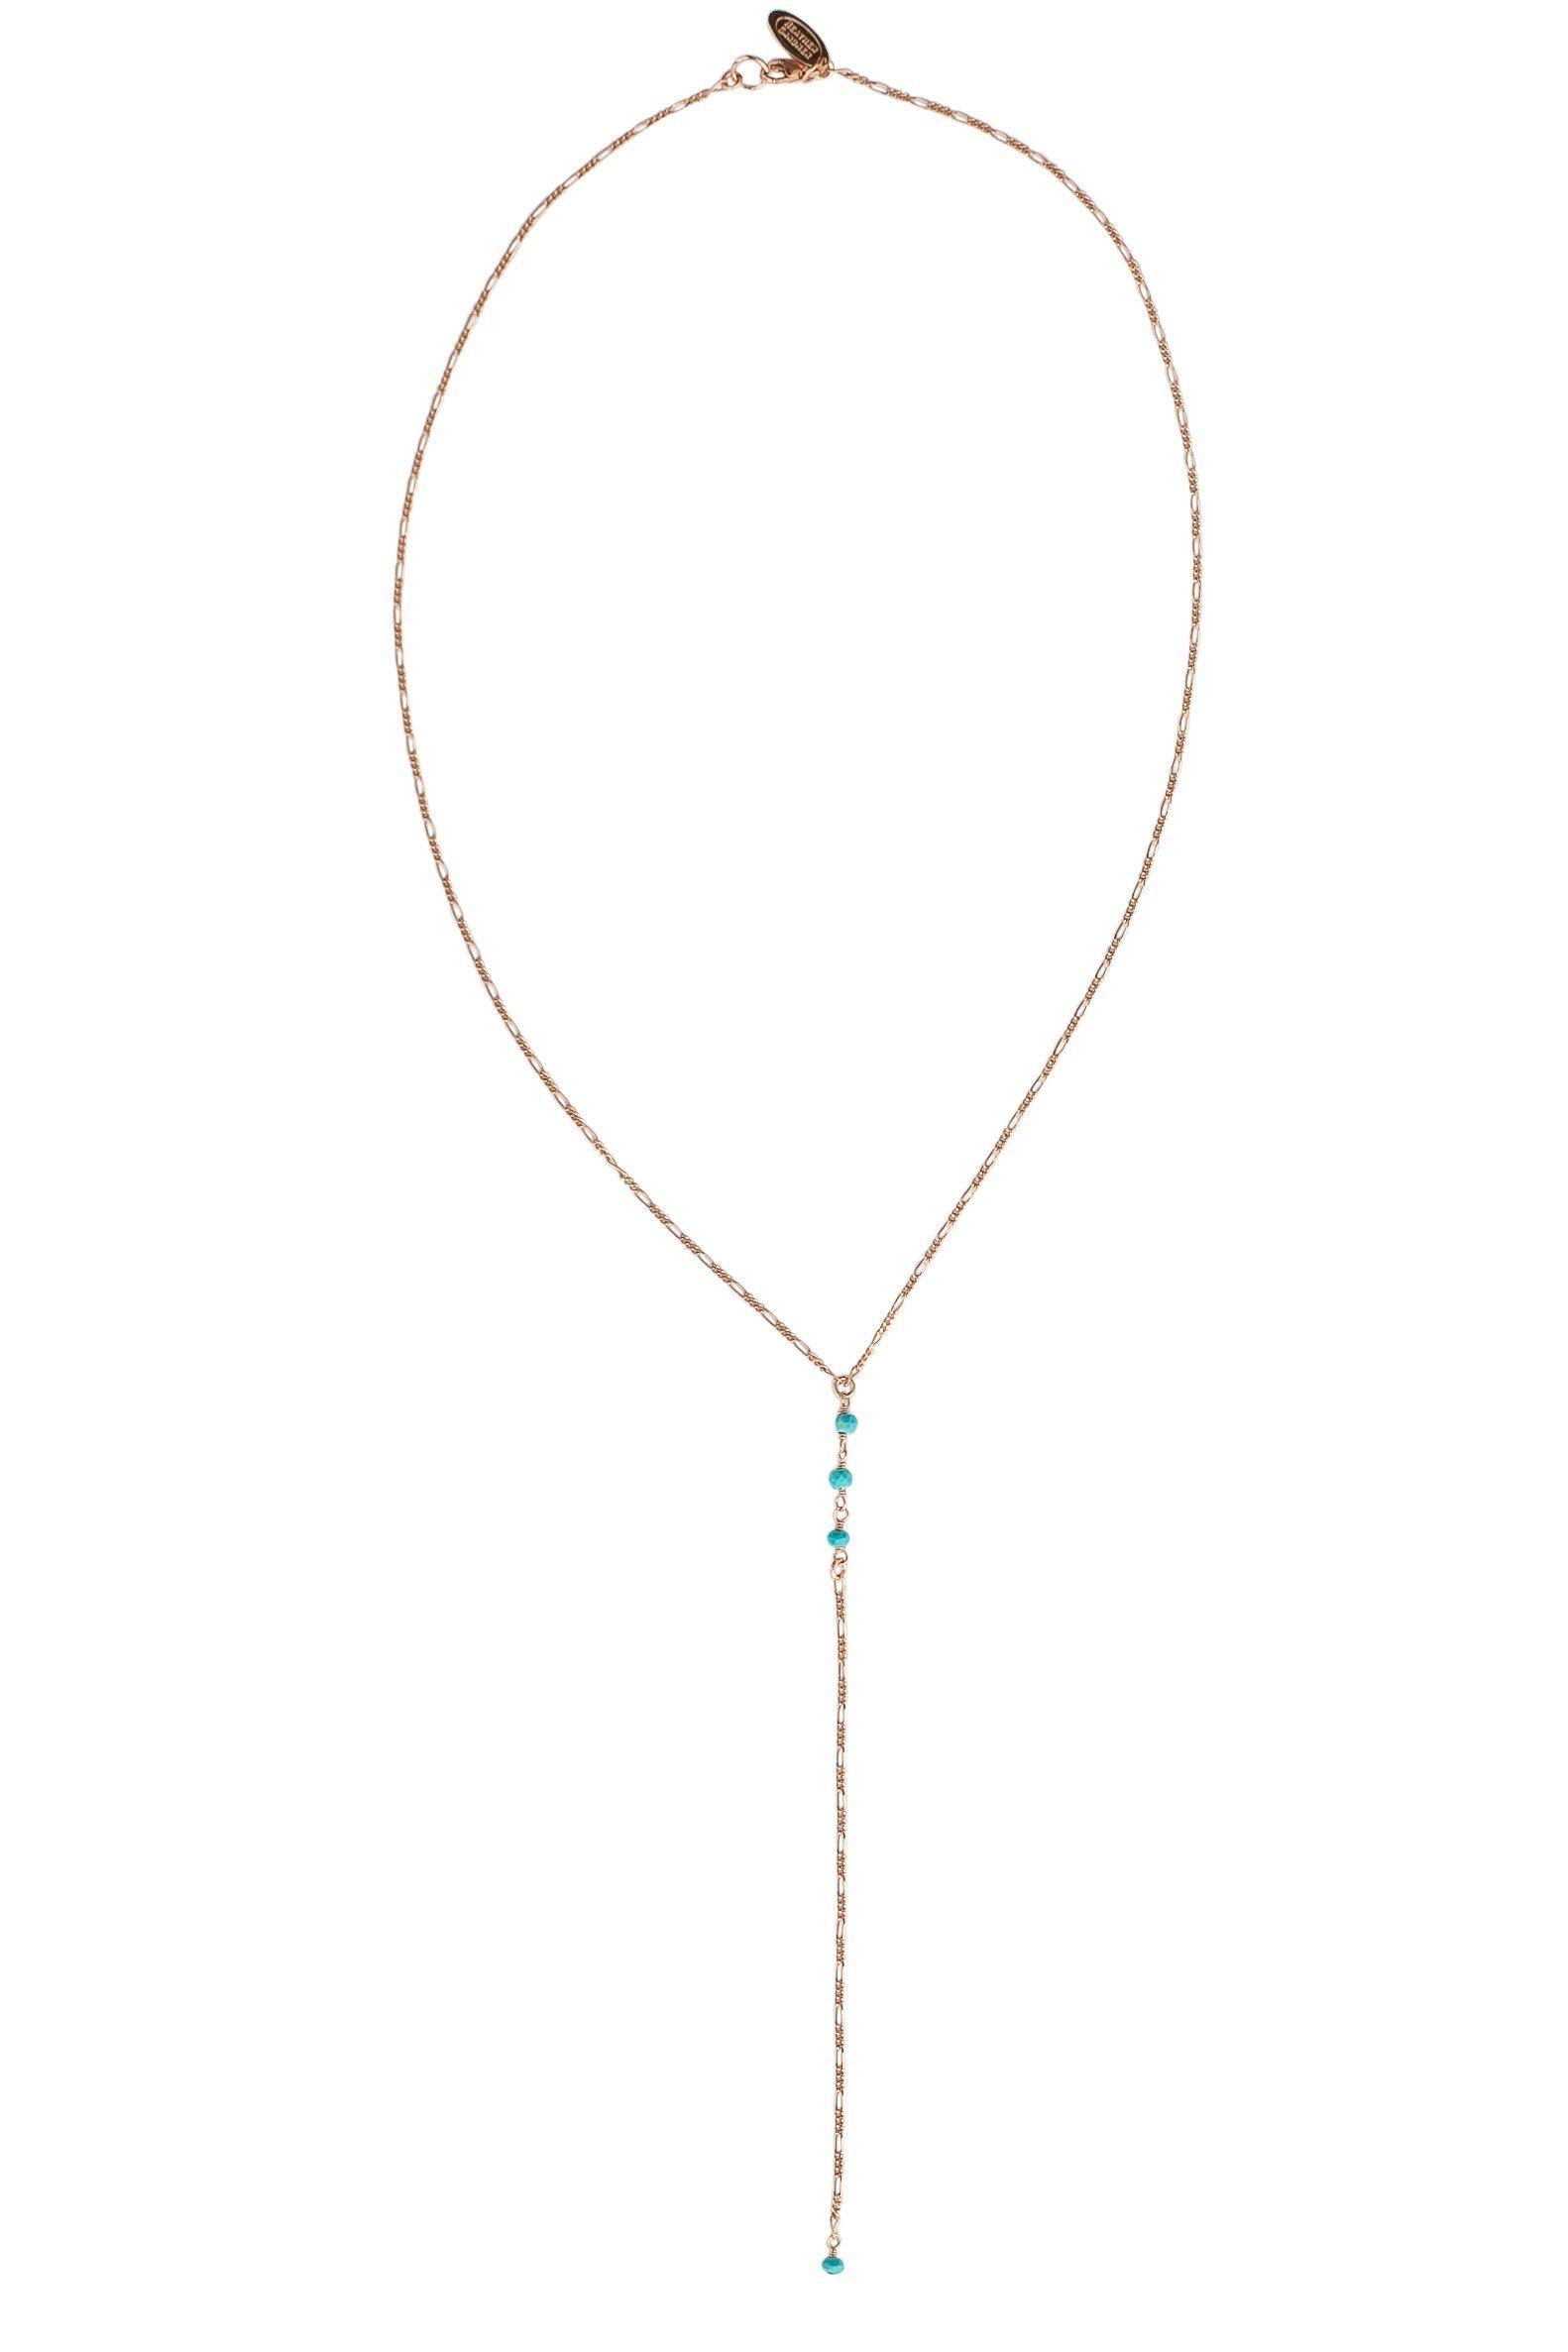 Heather Gardner - Turquoise Gemstone Petite Lariat in Gold, Rose Gold, or Silver